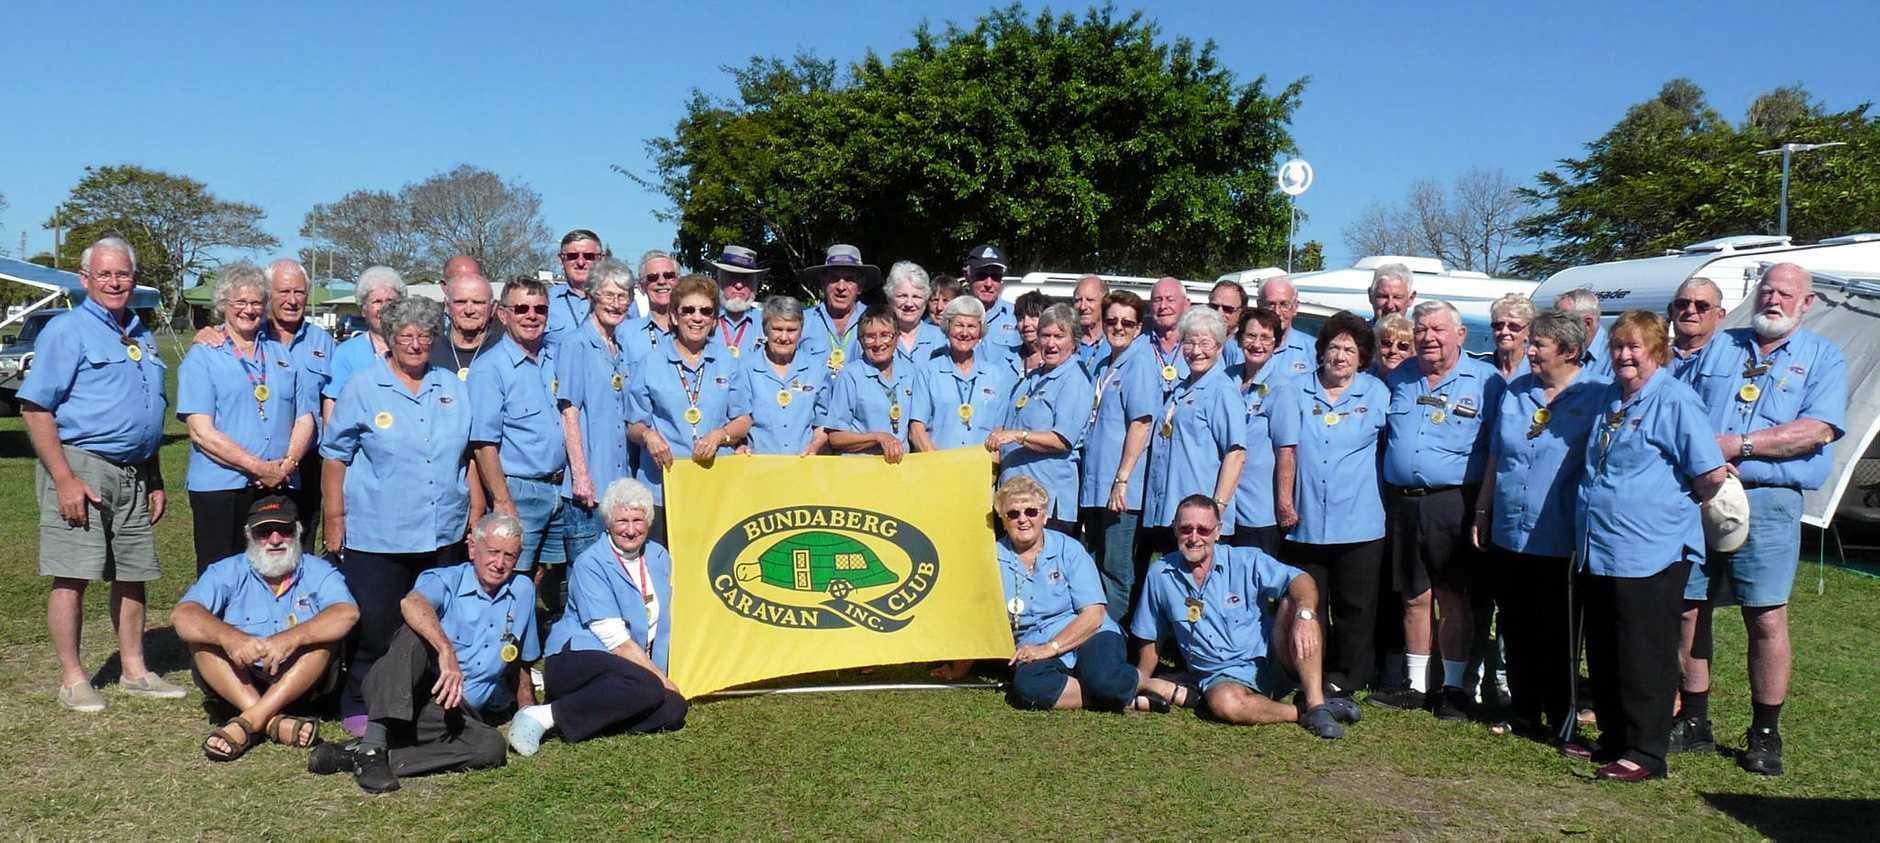 BIRTHDAY BASH: Members of the Bundaberg Caravan Club celebrate their 20th birthday.